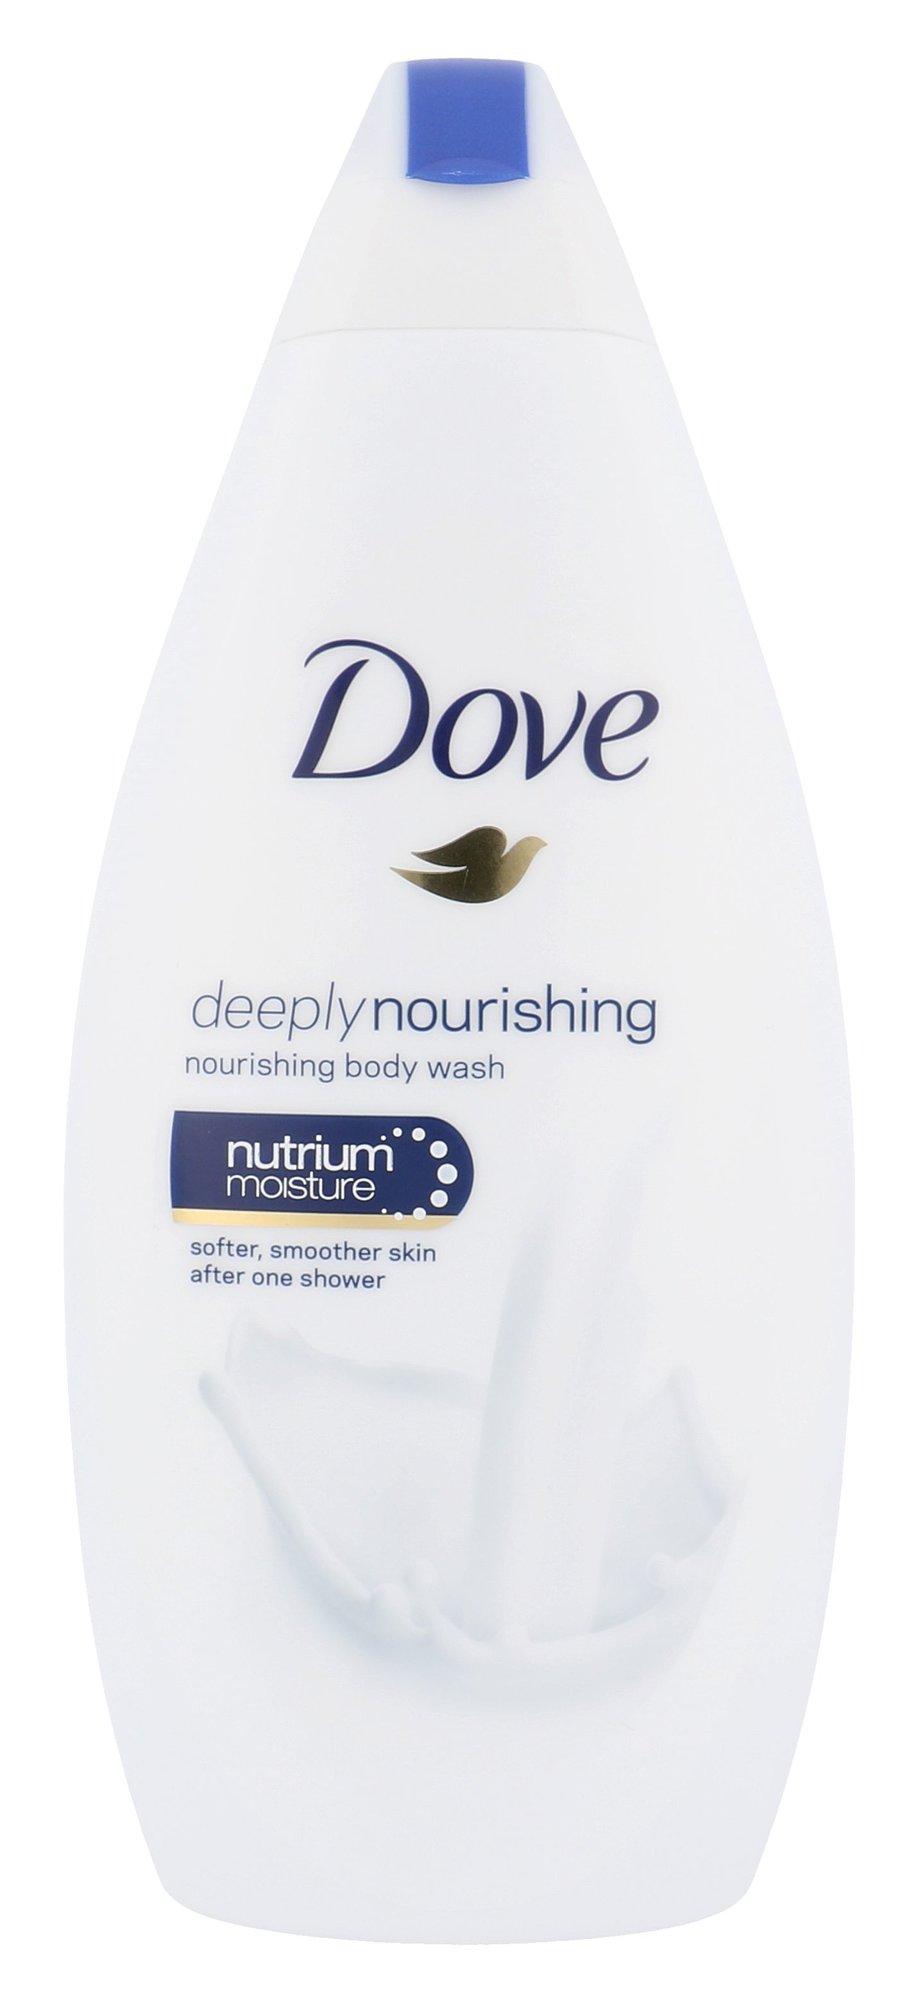 Dove Deeply Nourishing Cosmetic 500ml